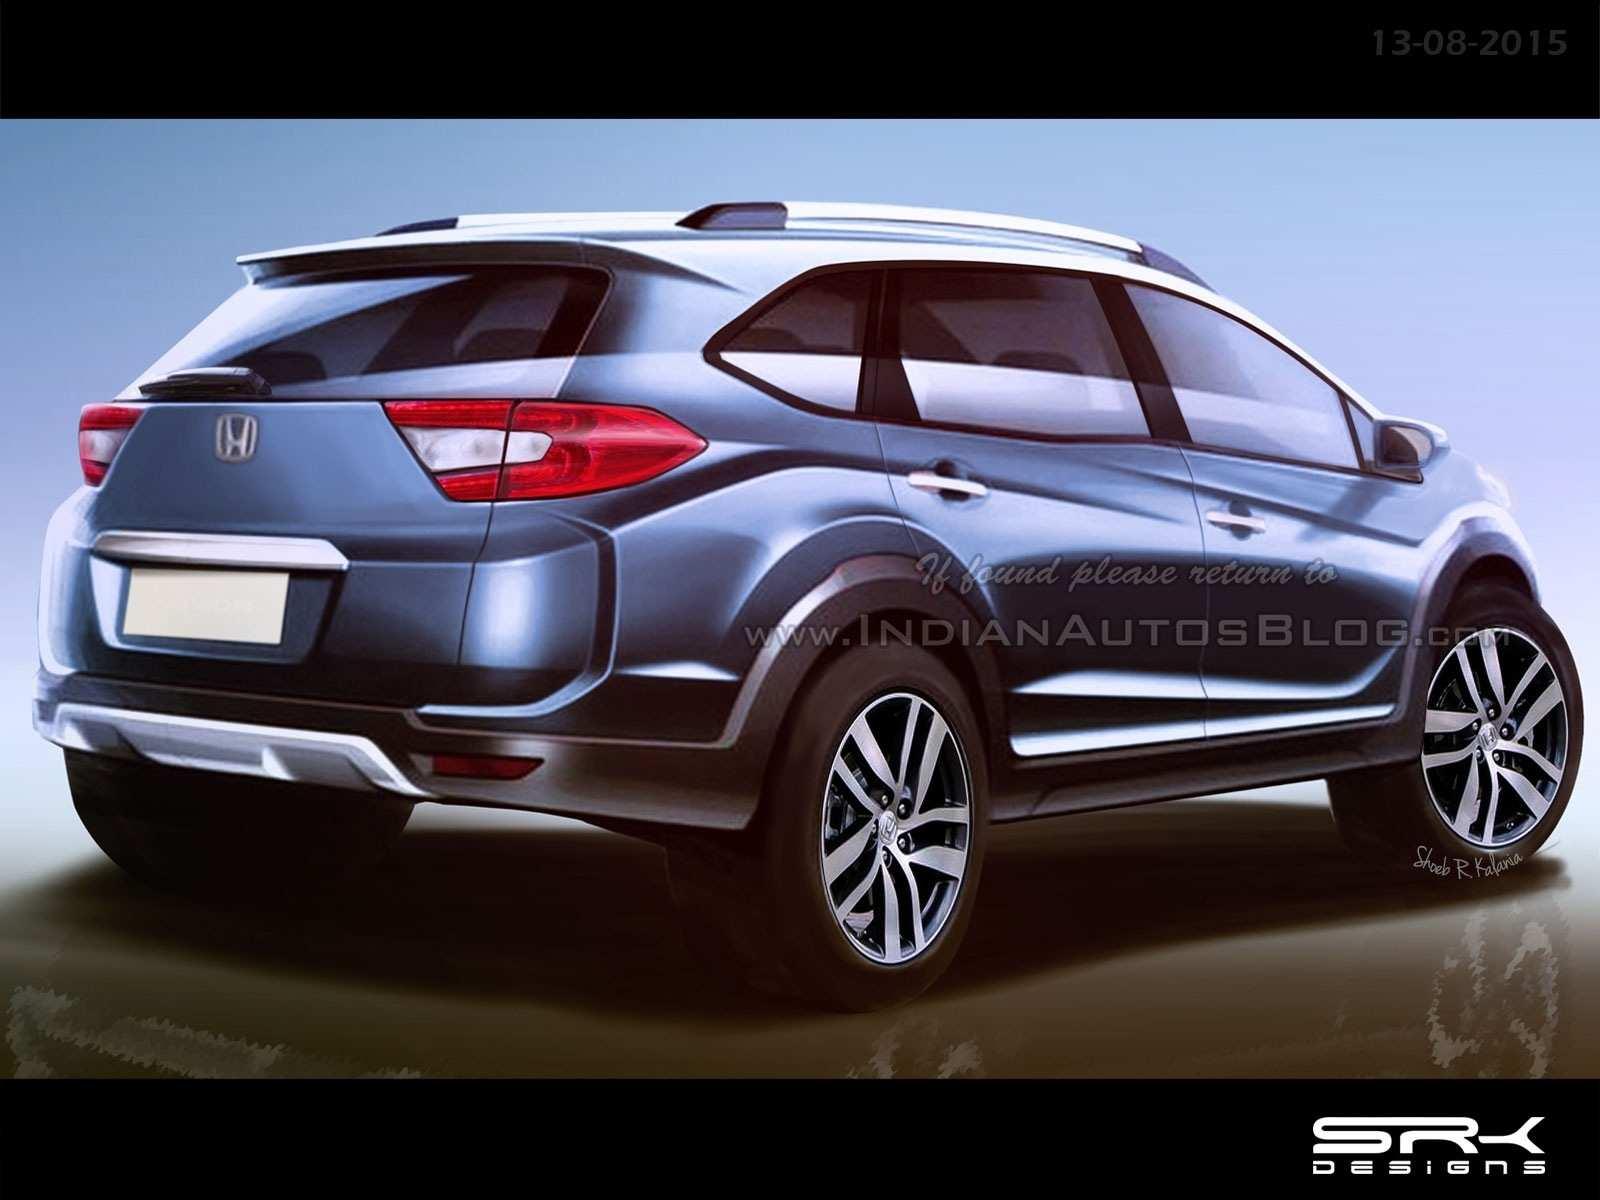 60 Best Review Honda Brv 2020 Malaysia Wallpaper with Honda Brv 2020 Malaysia